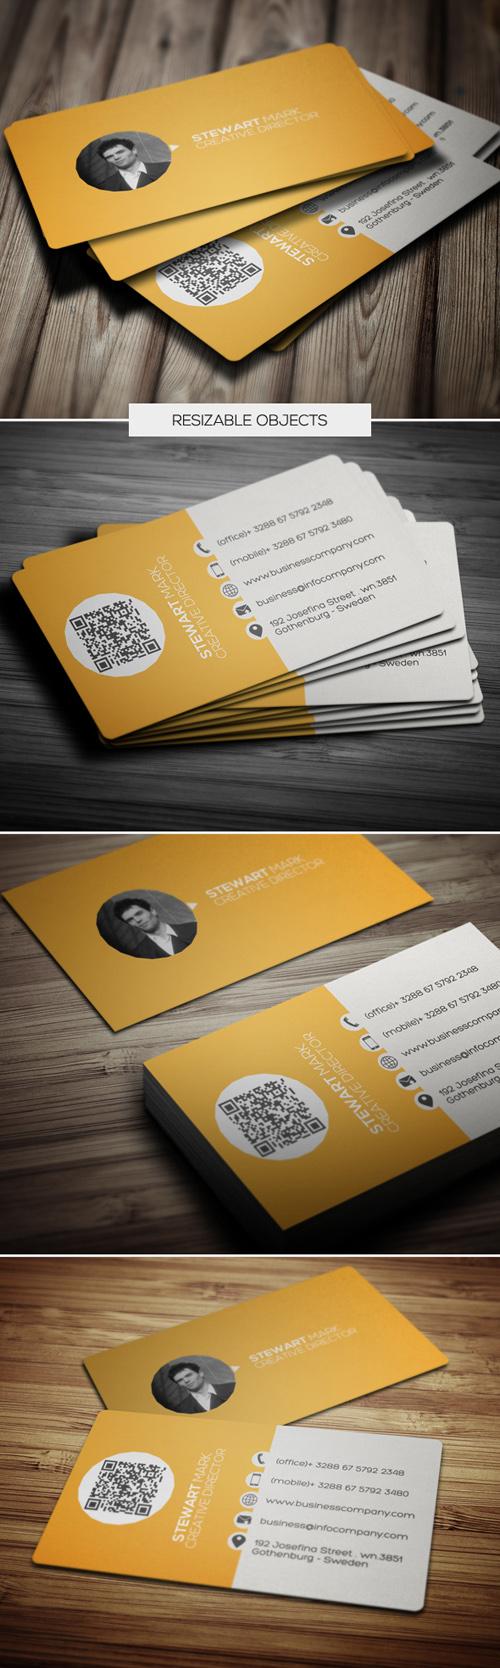 Creative Business Cards Design-8